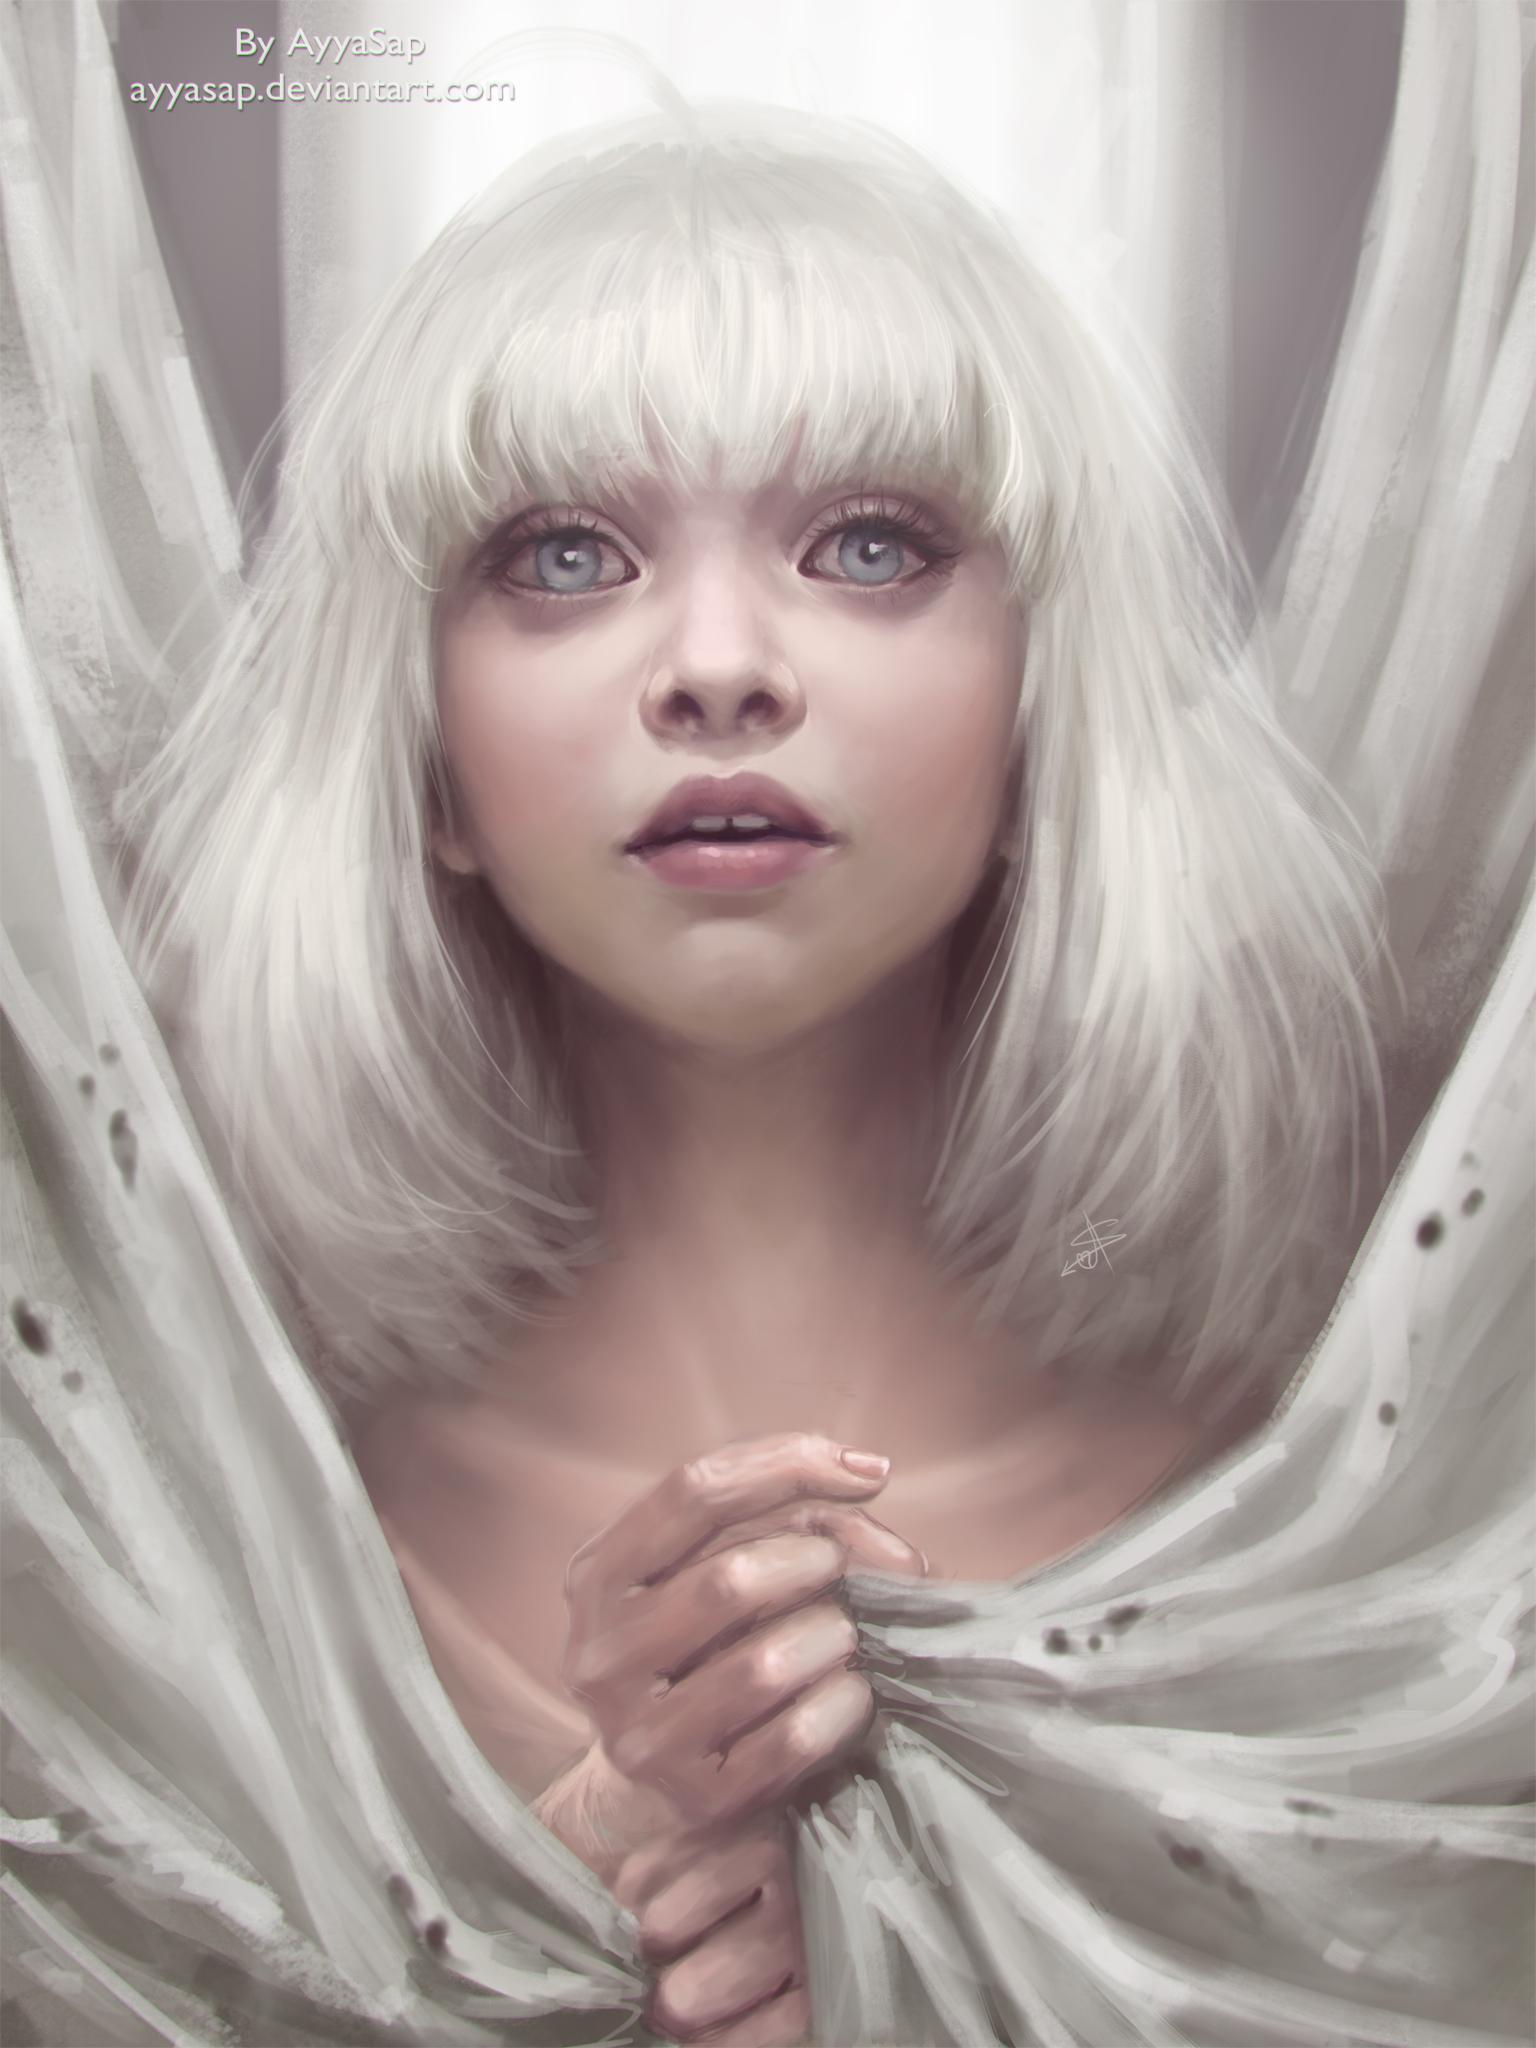 maddie sia Maddie Ziegler (Sia - Chandelier) by AyyaSAP